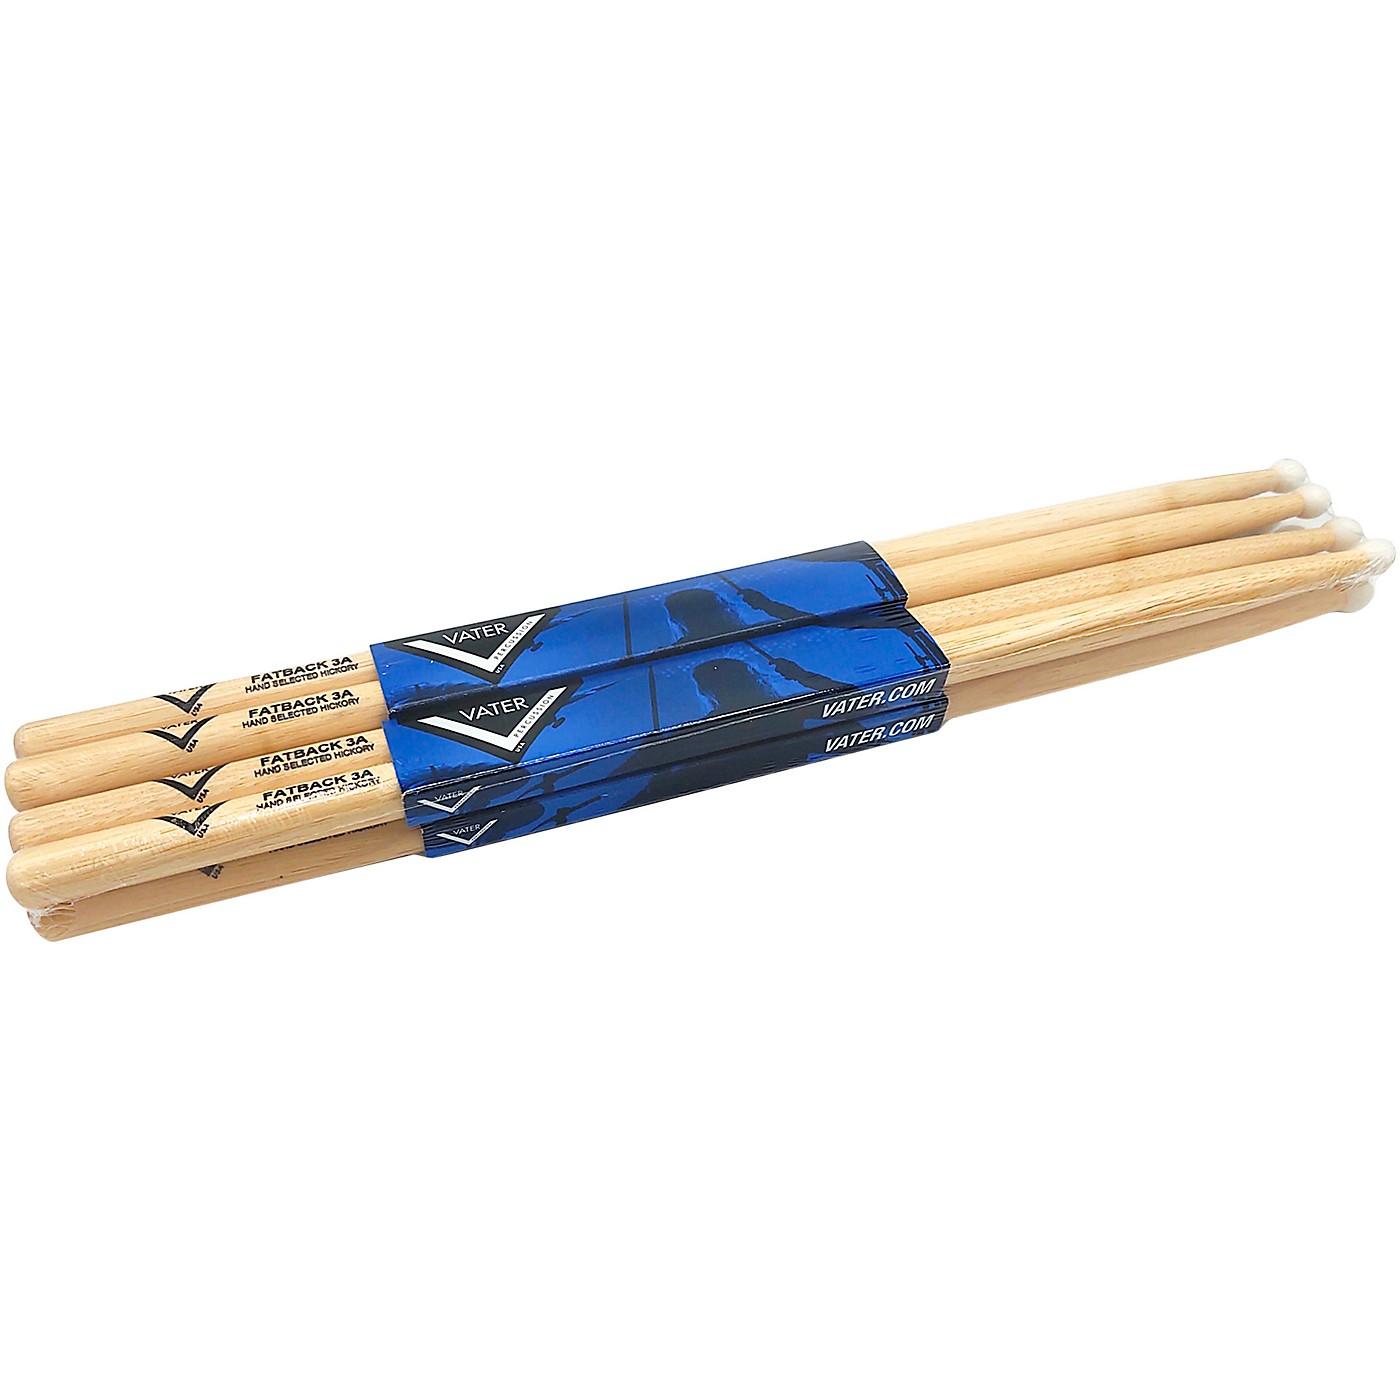 Vater Hickory Drum Stick Prepack thumbnail